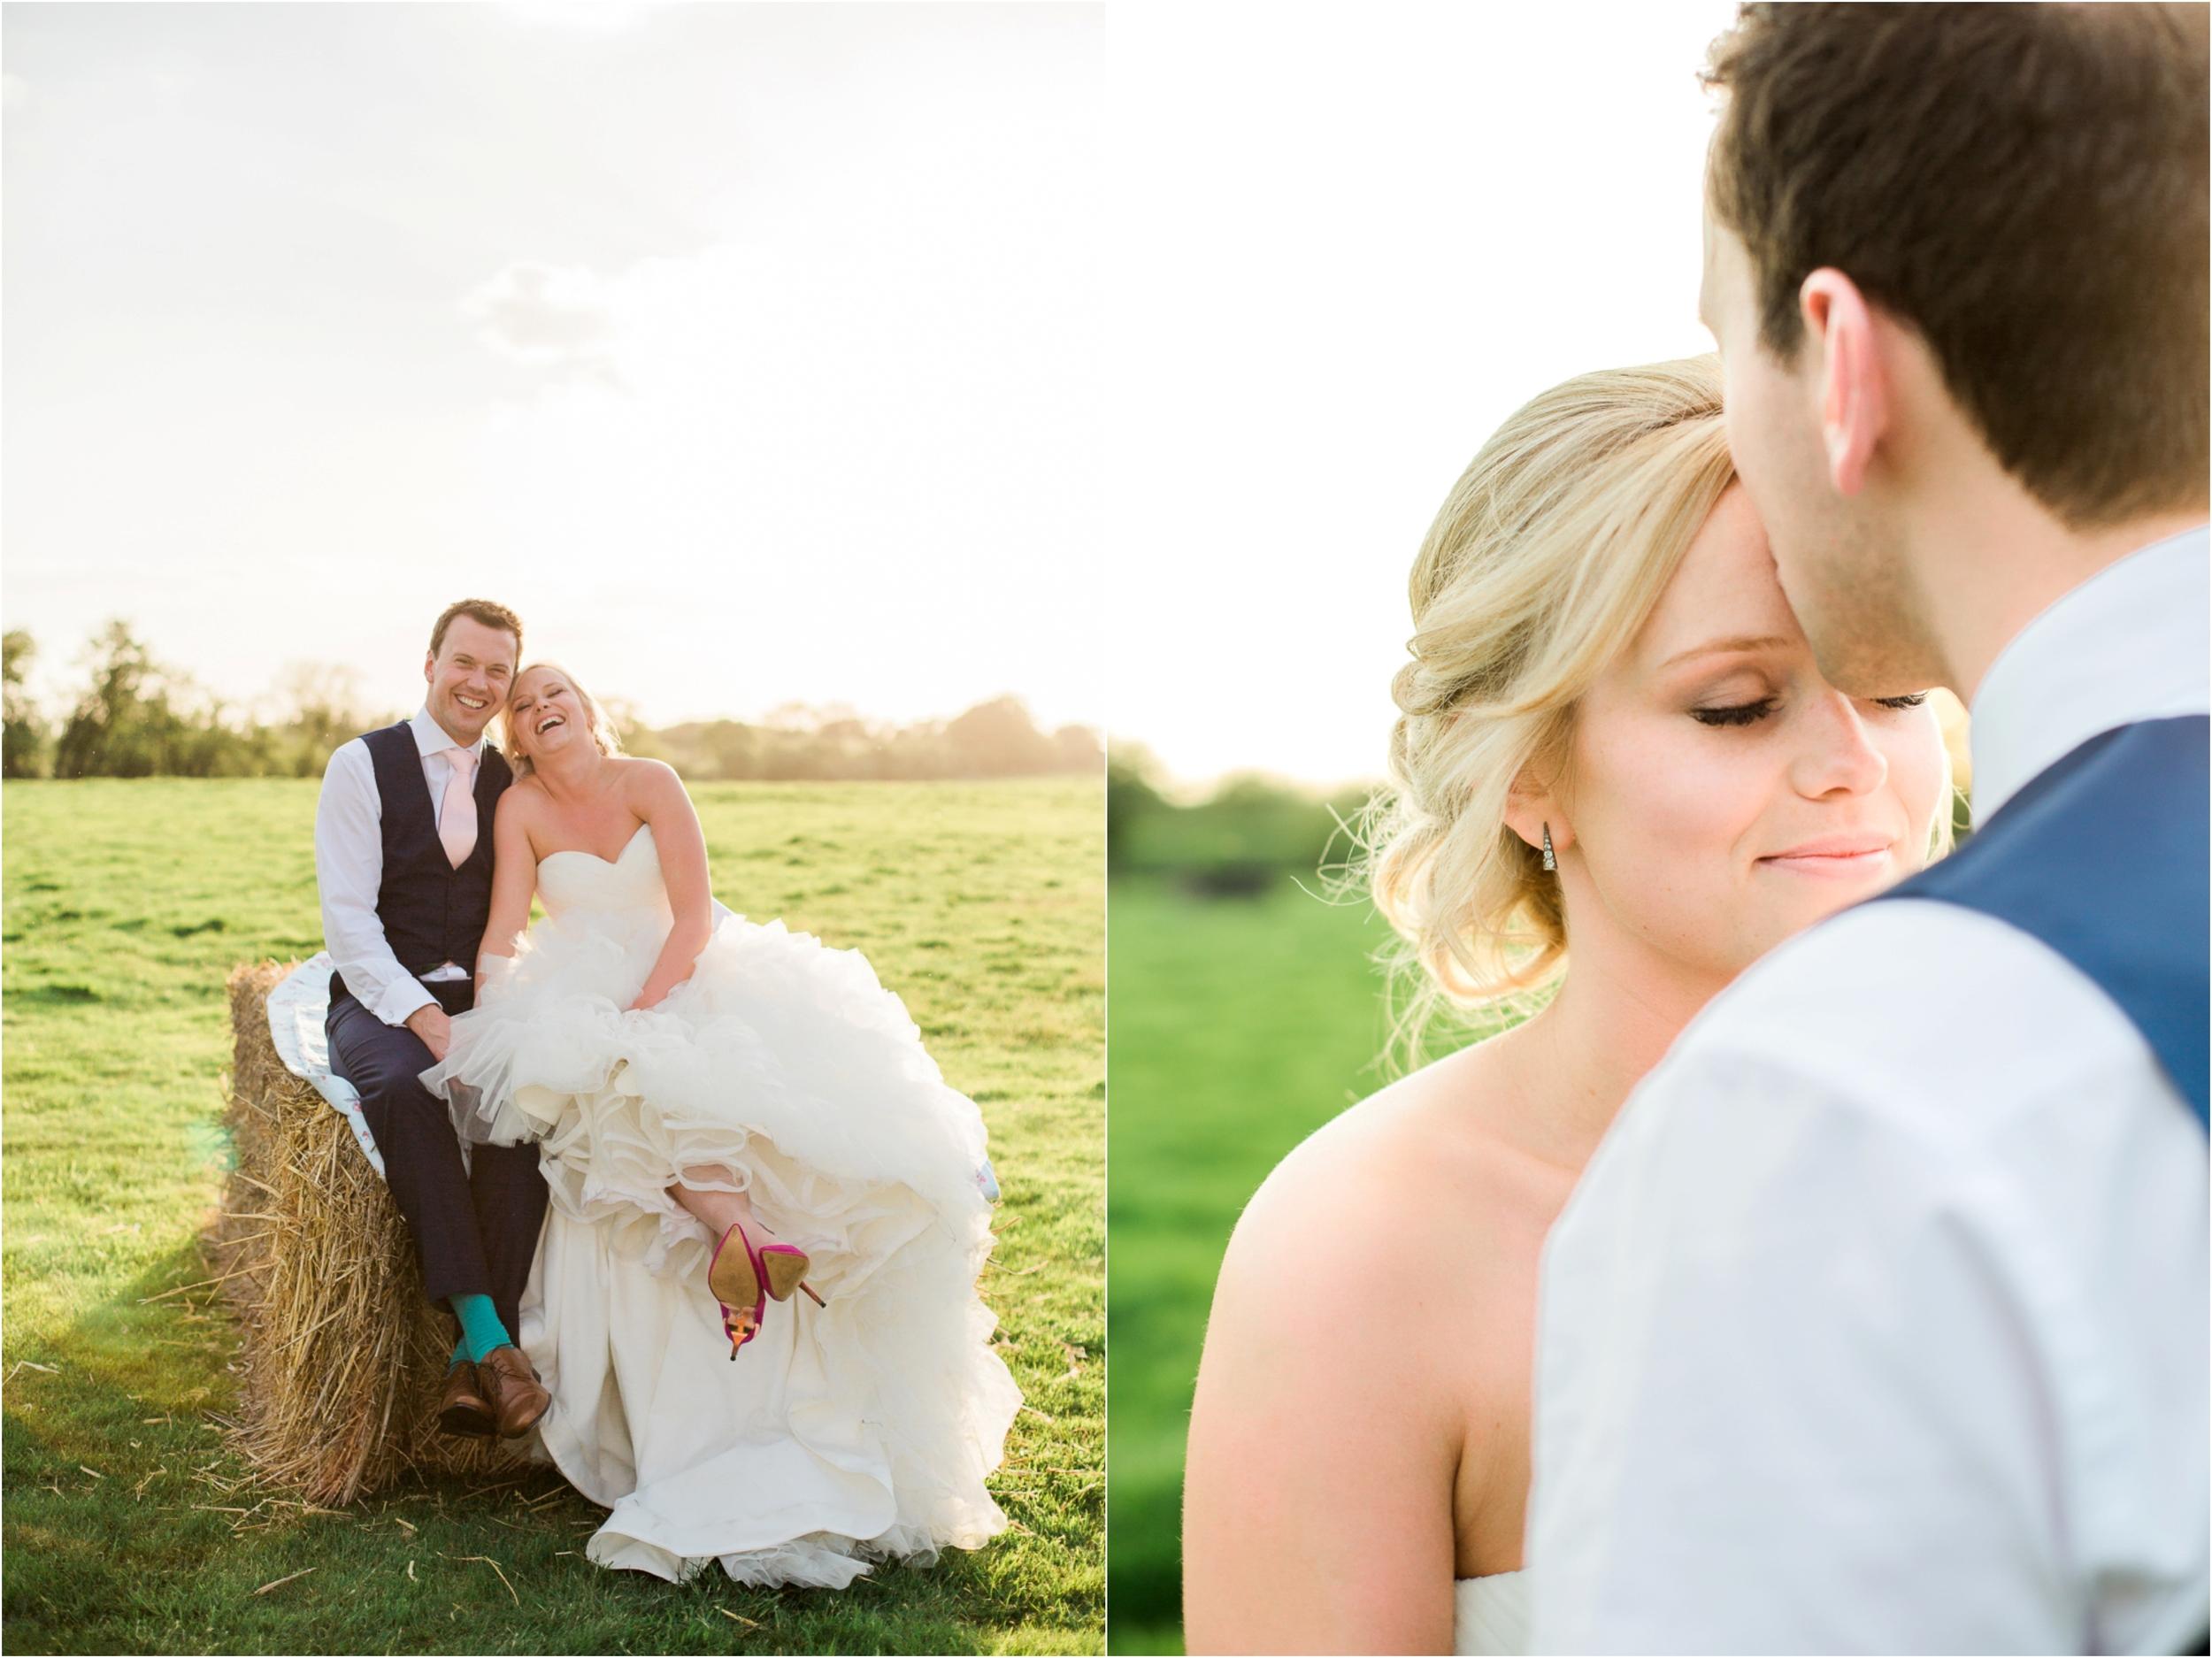 Sophie Evans Photography, Gus & Emma Farm Wedding, Warwick School Wedding. Warwickshire Wedding Photographer-127.jpg